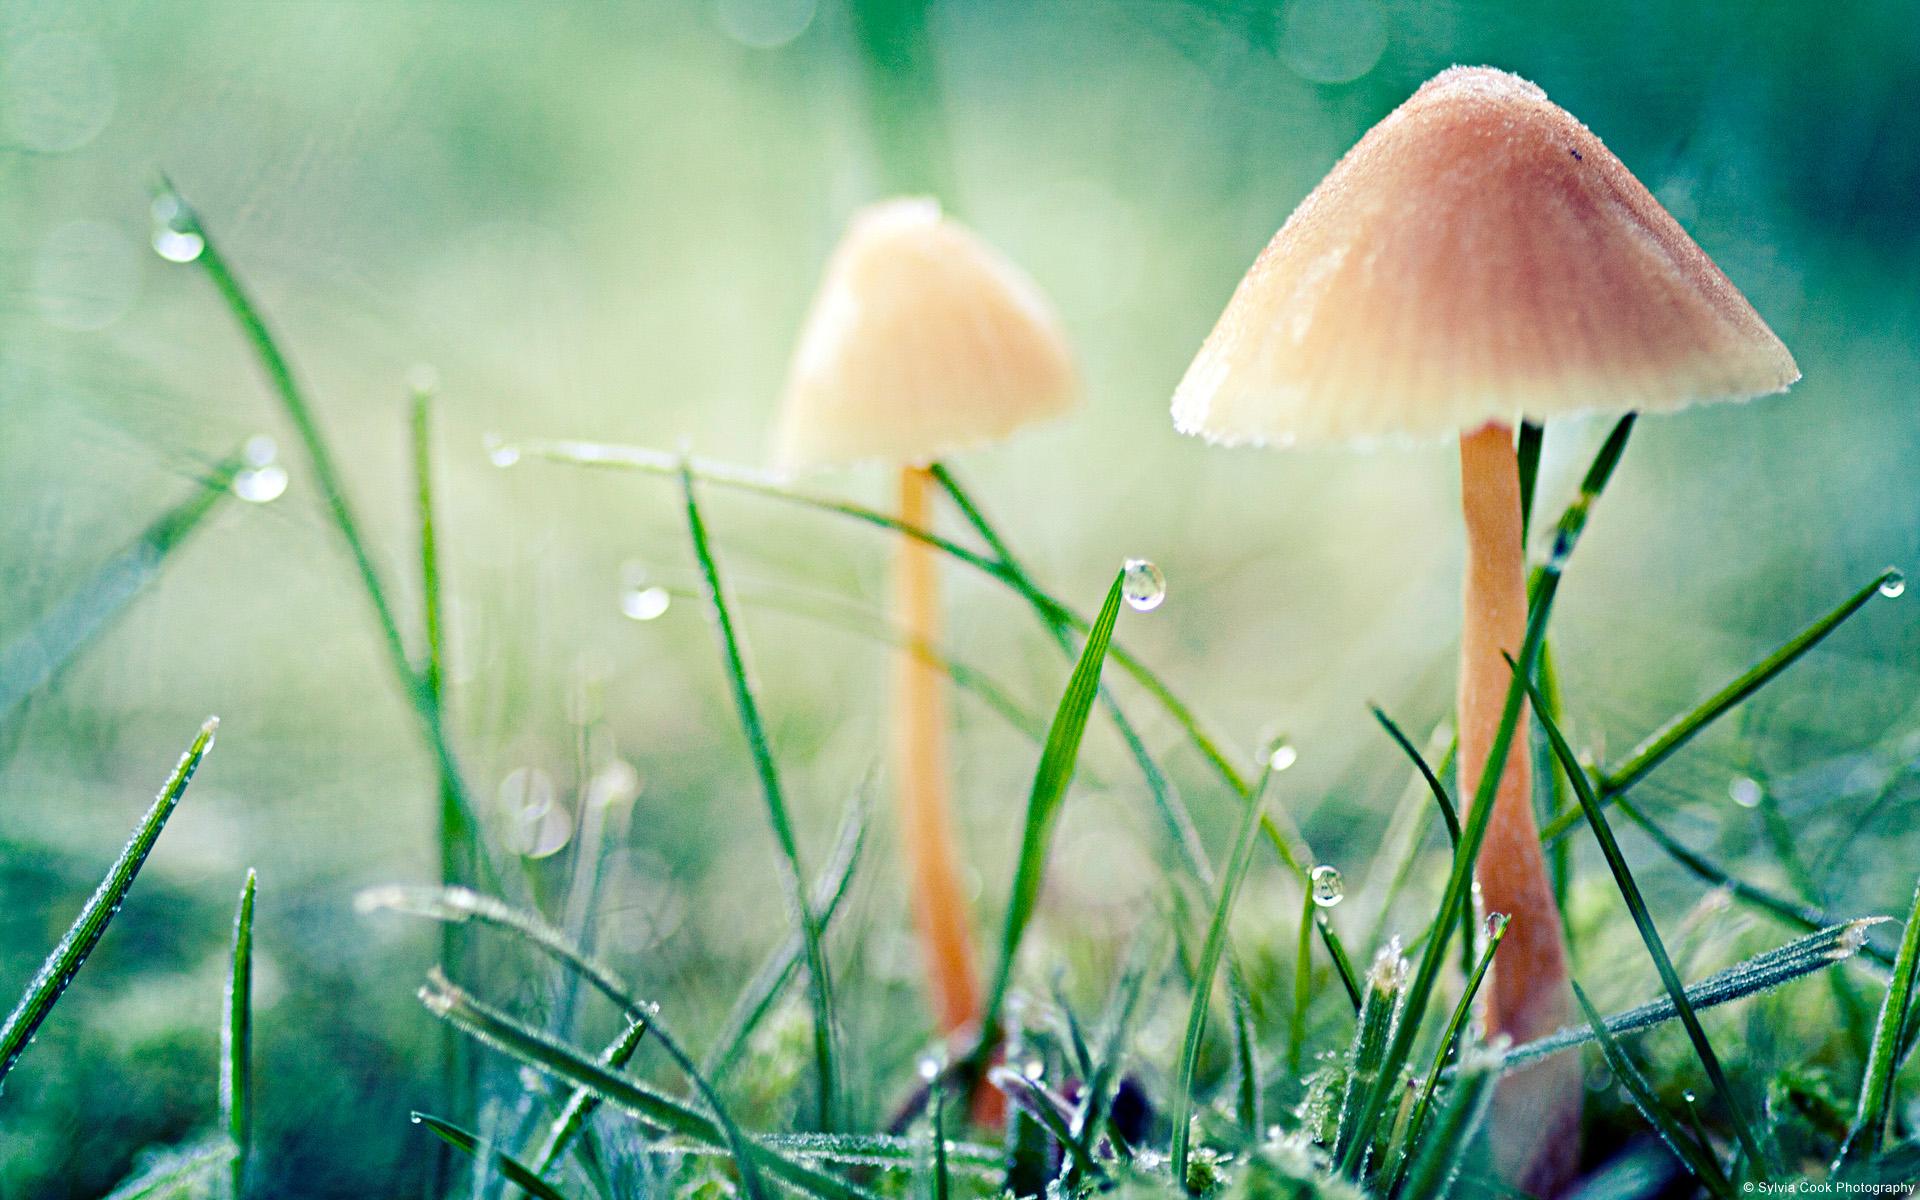 mushroom wallpaper phone - photo #13